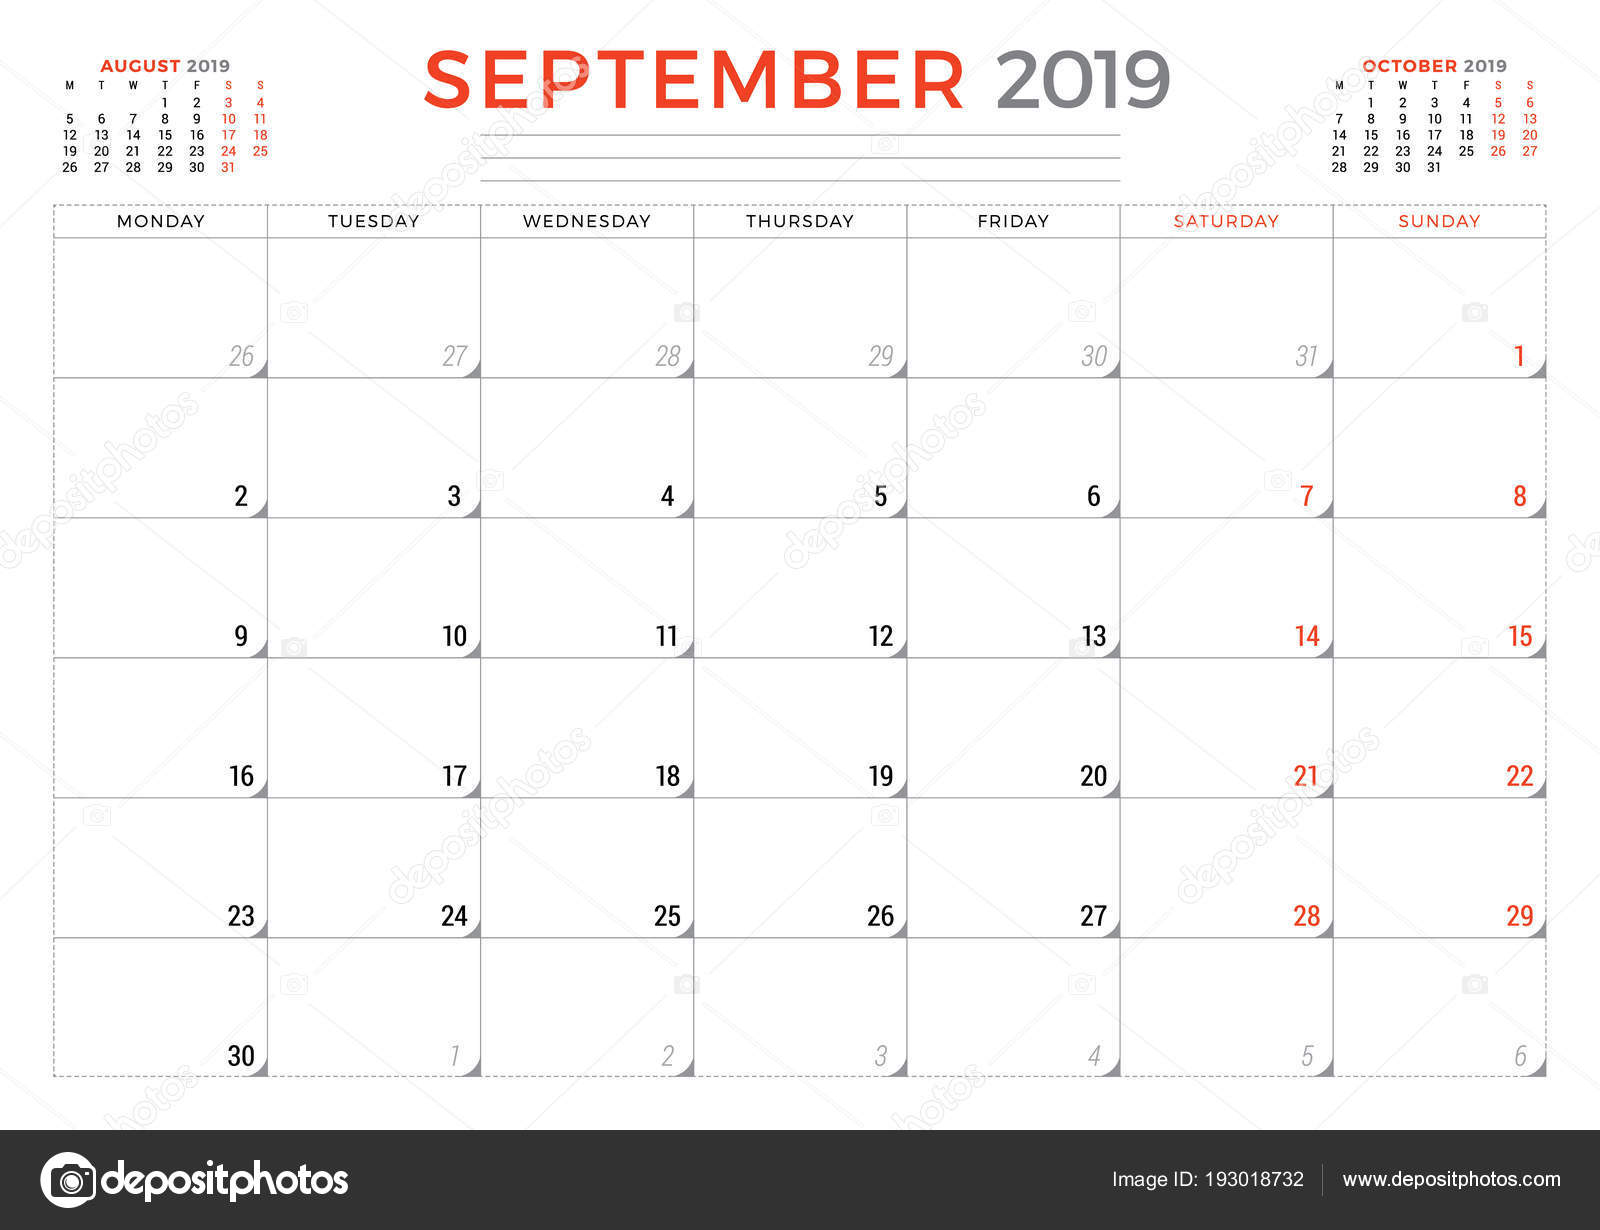 28 Eylül 2019 Pazartesi